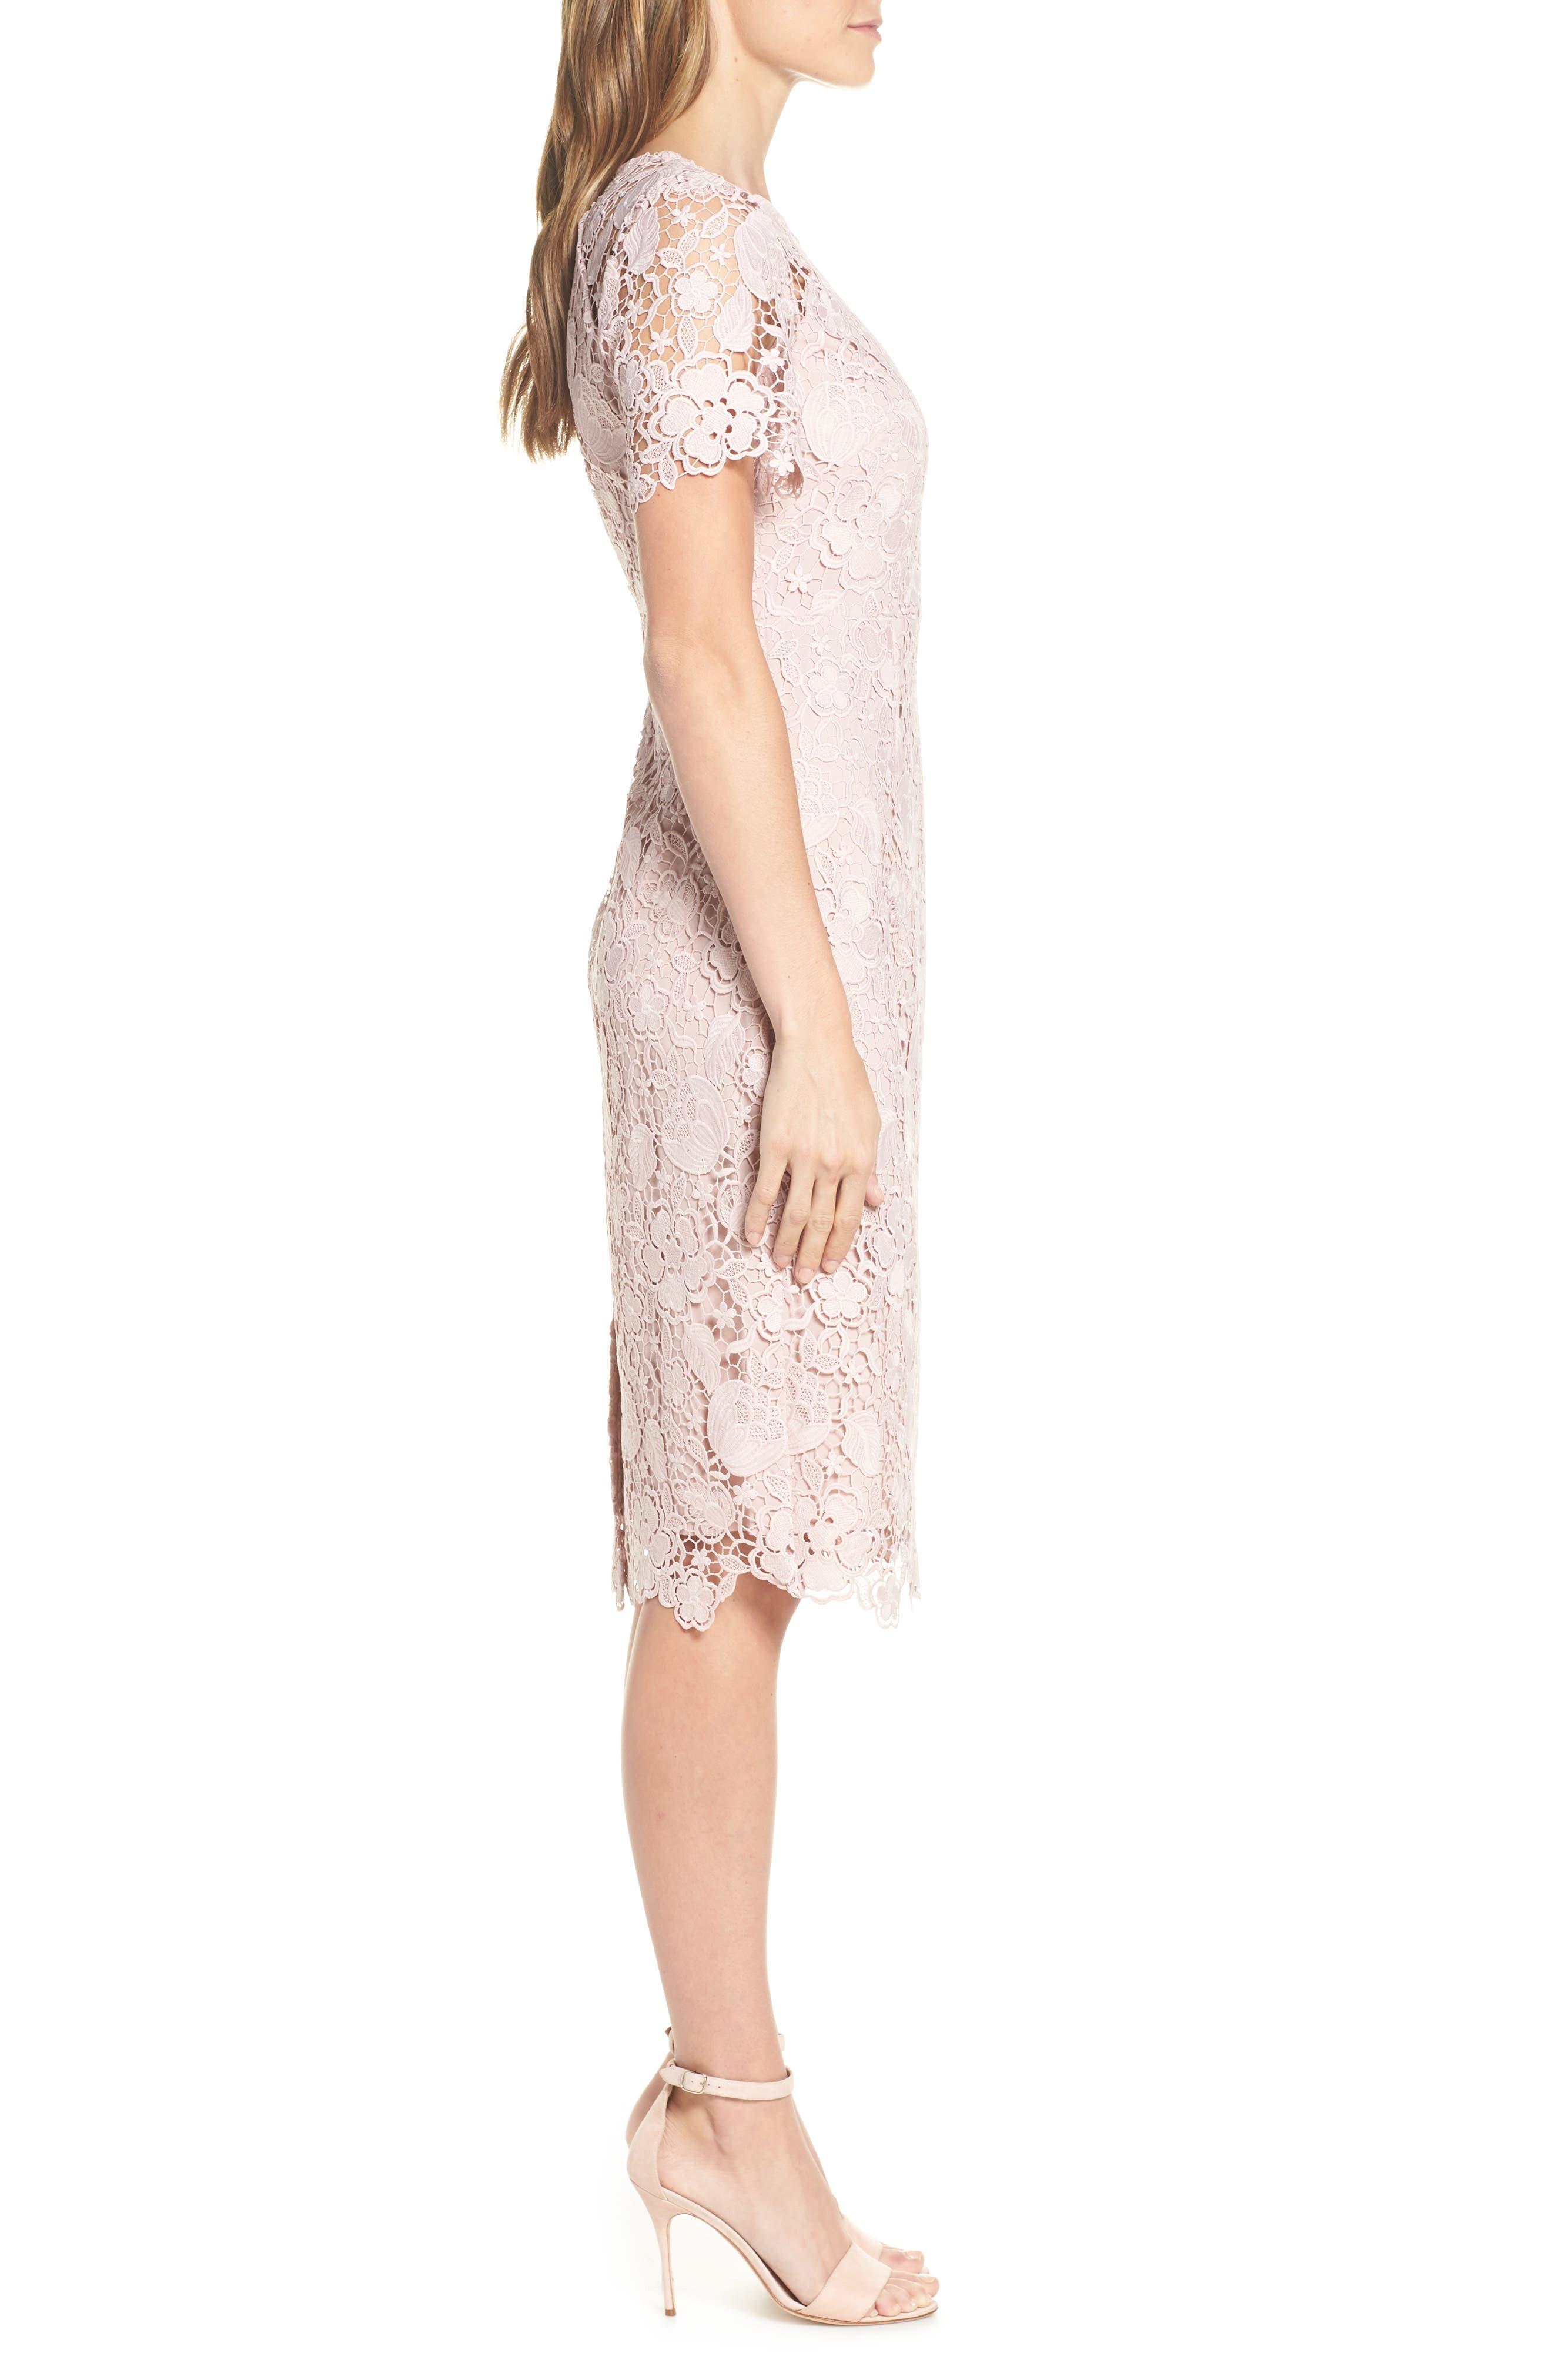 ELIZA J, Embroidered Lace Sheath Dress, Alternate thumbnail 4, color, NUDE